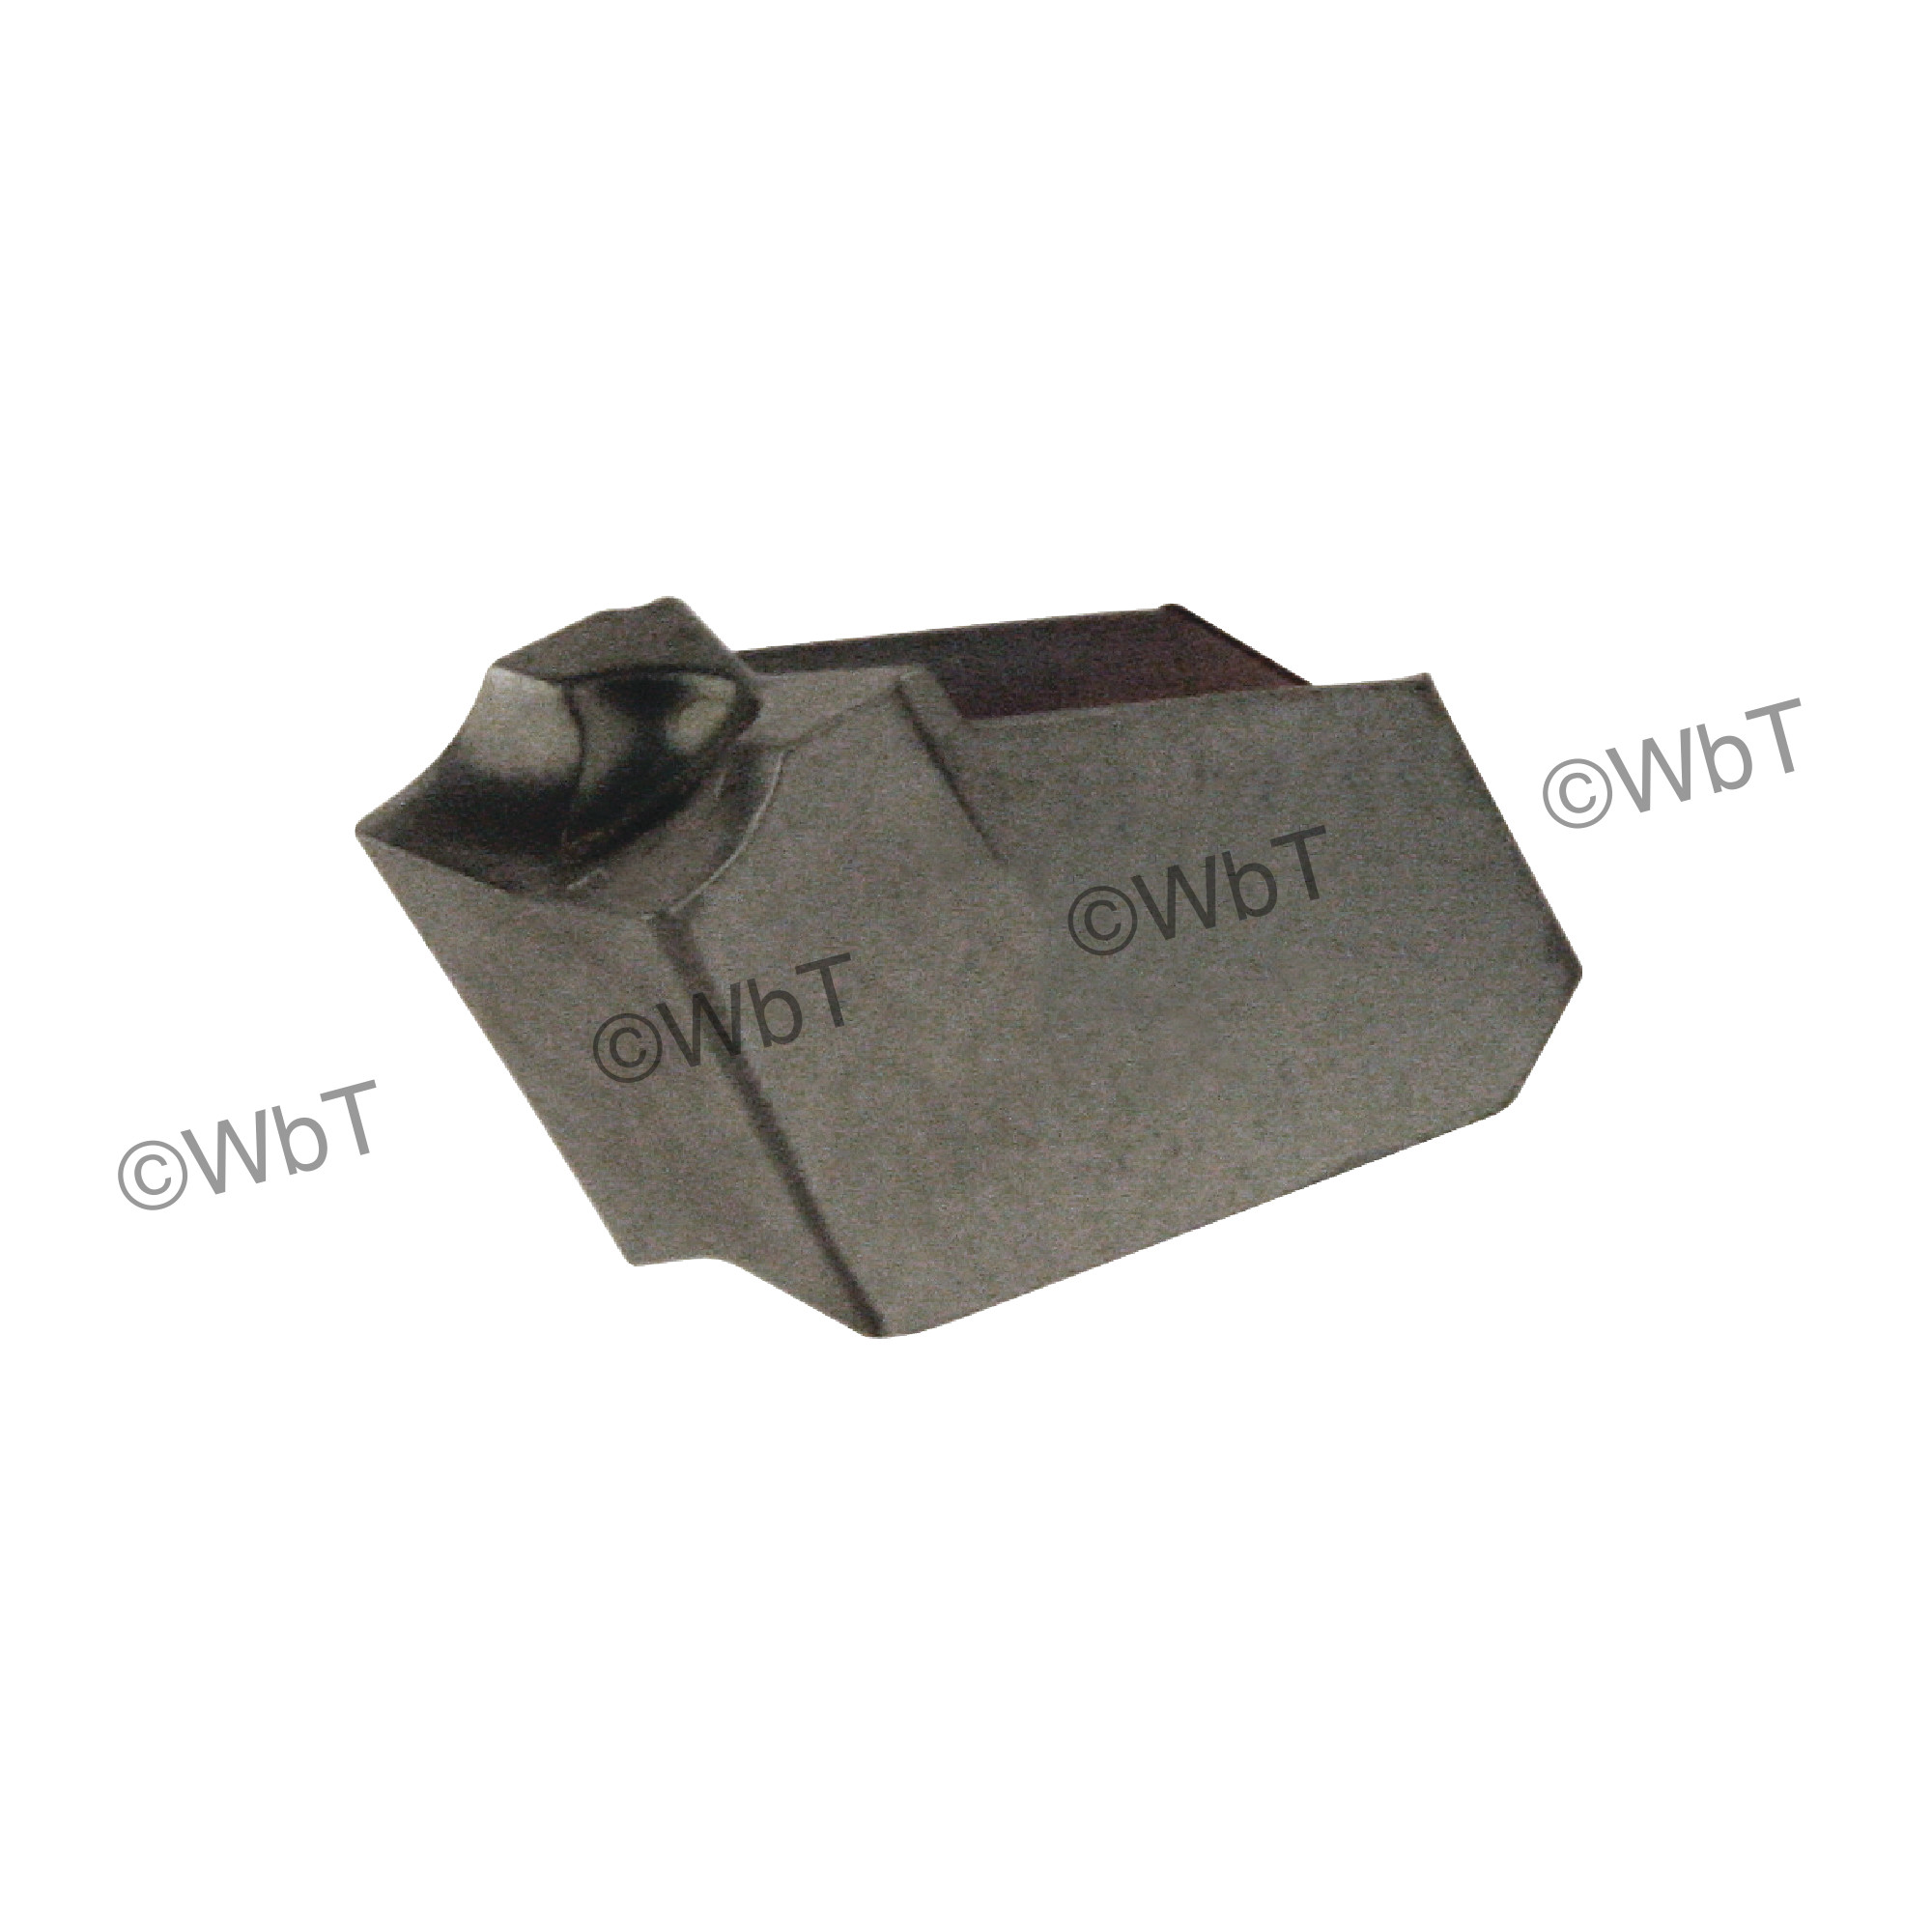 "ISCAR - GFN-1.2J IC354 / GFN - SELF-GRIP Indexable Carbide Insert / 0.047"" Cutting Width"